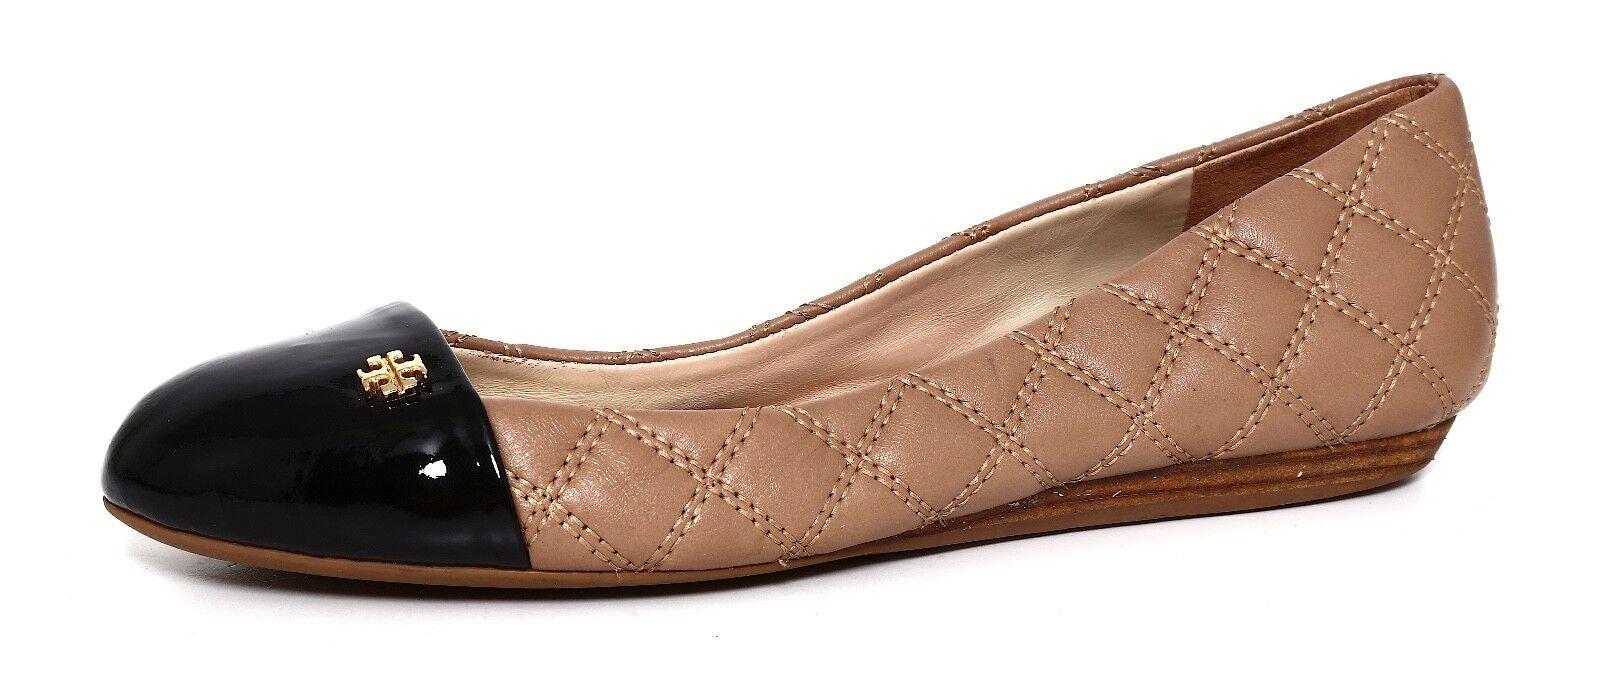 Tory Burch Claremont Leather Flat Beige Women Sz 7.5 M 2067